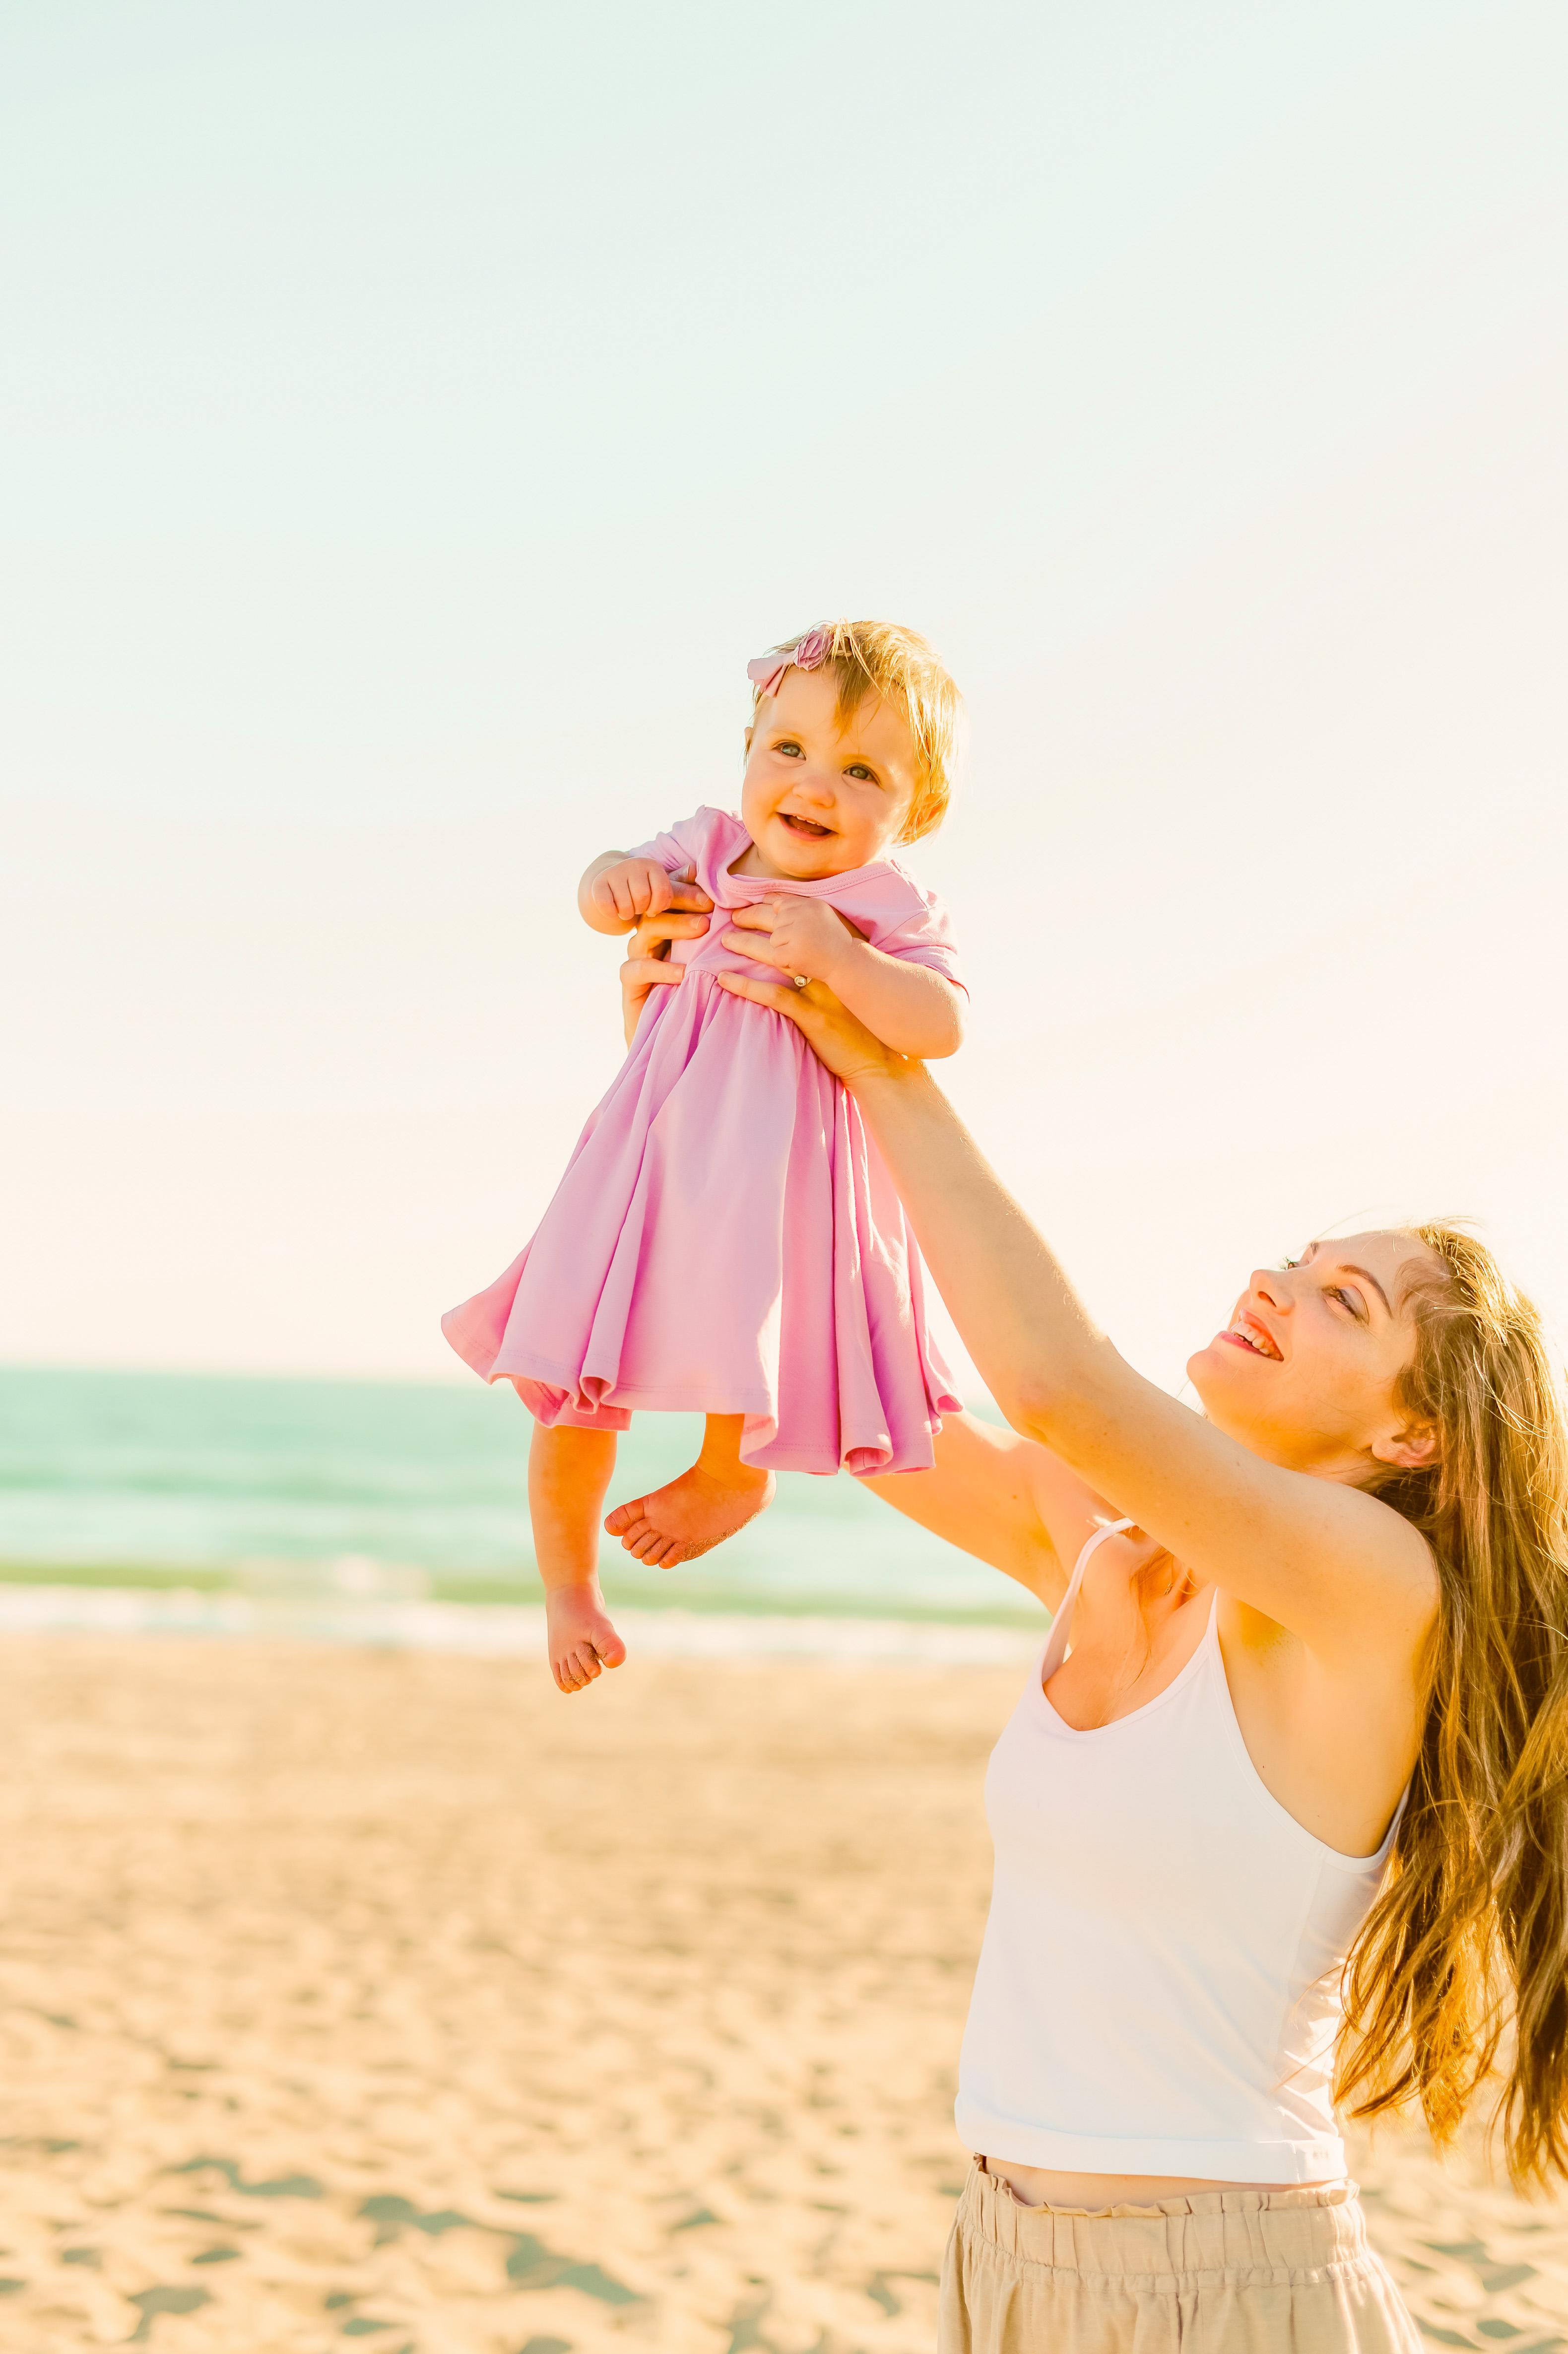 Rosalie in a pink dress baby beach